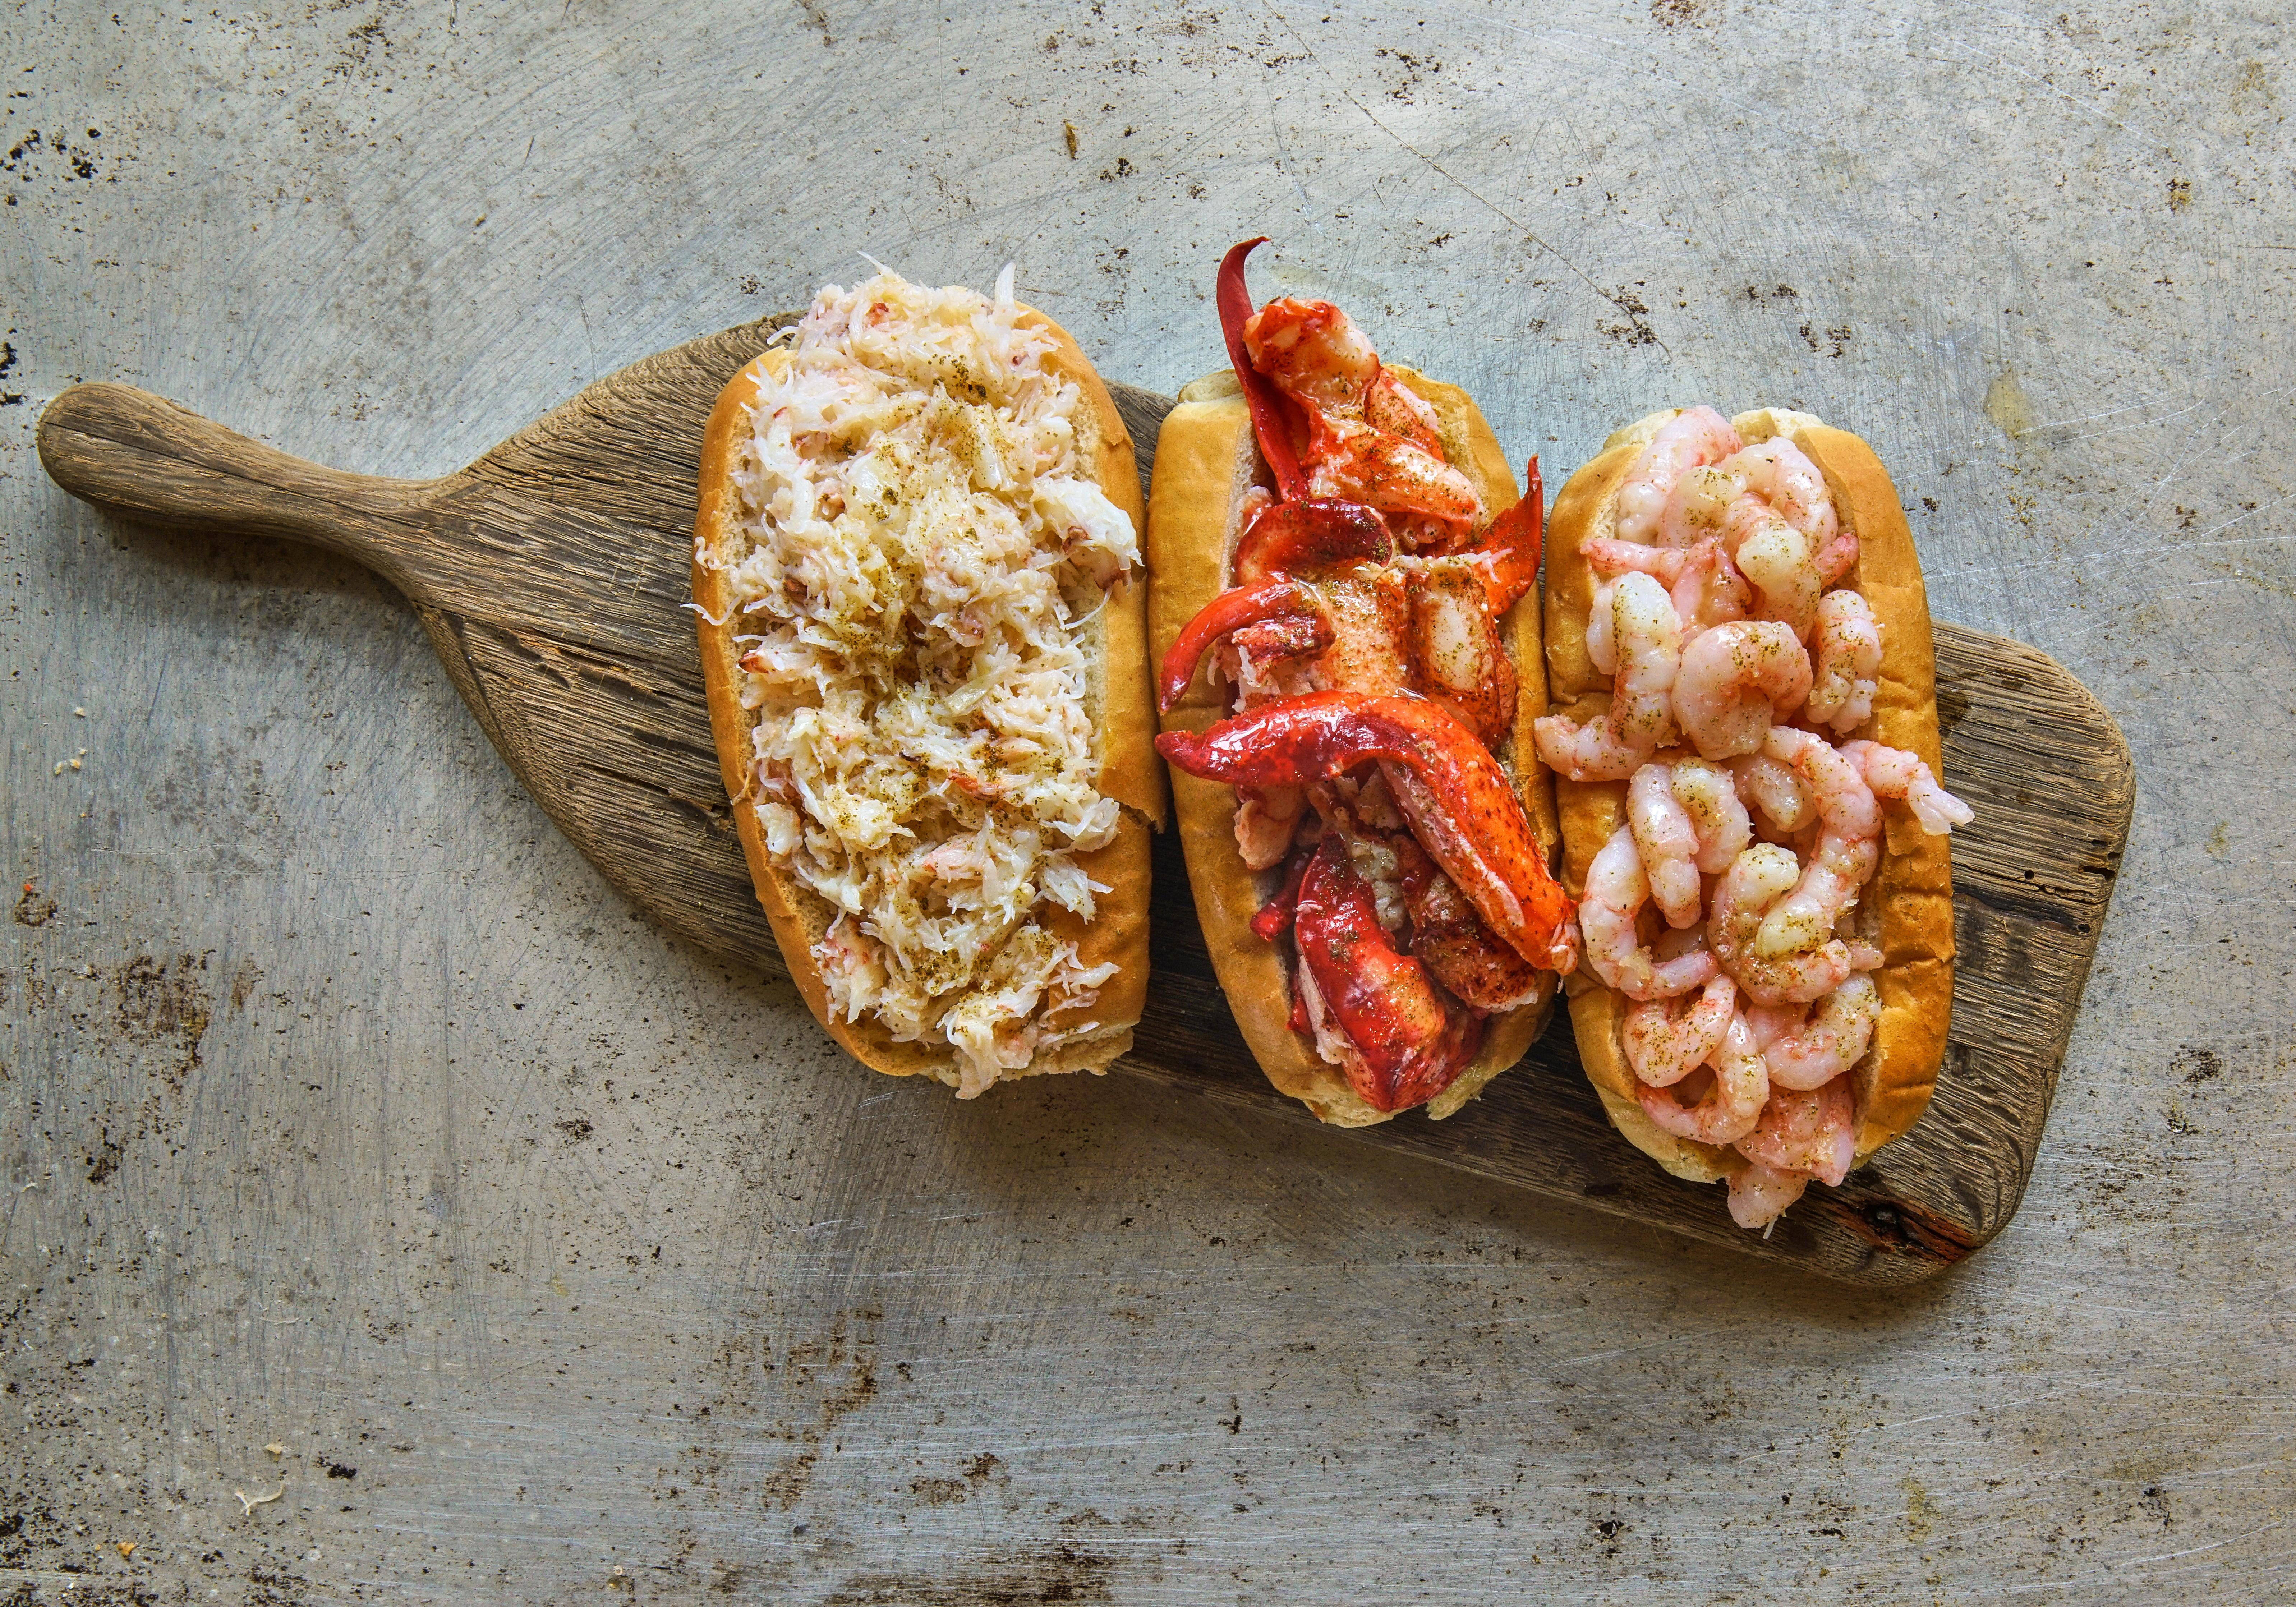 Crab, lobster, and shrimp rolls at Luke's Lobster